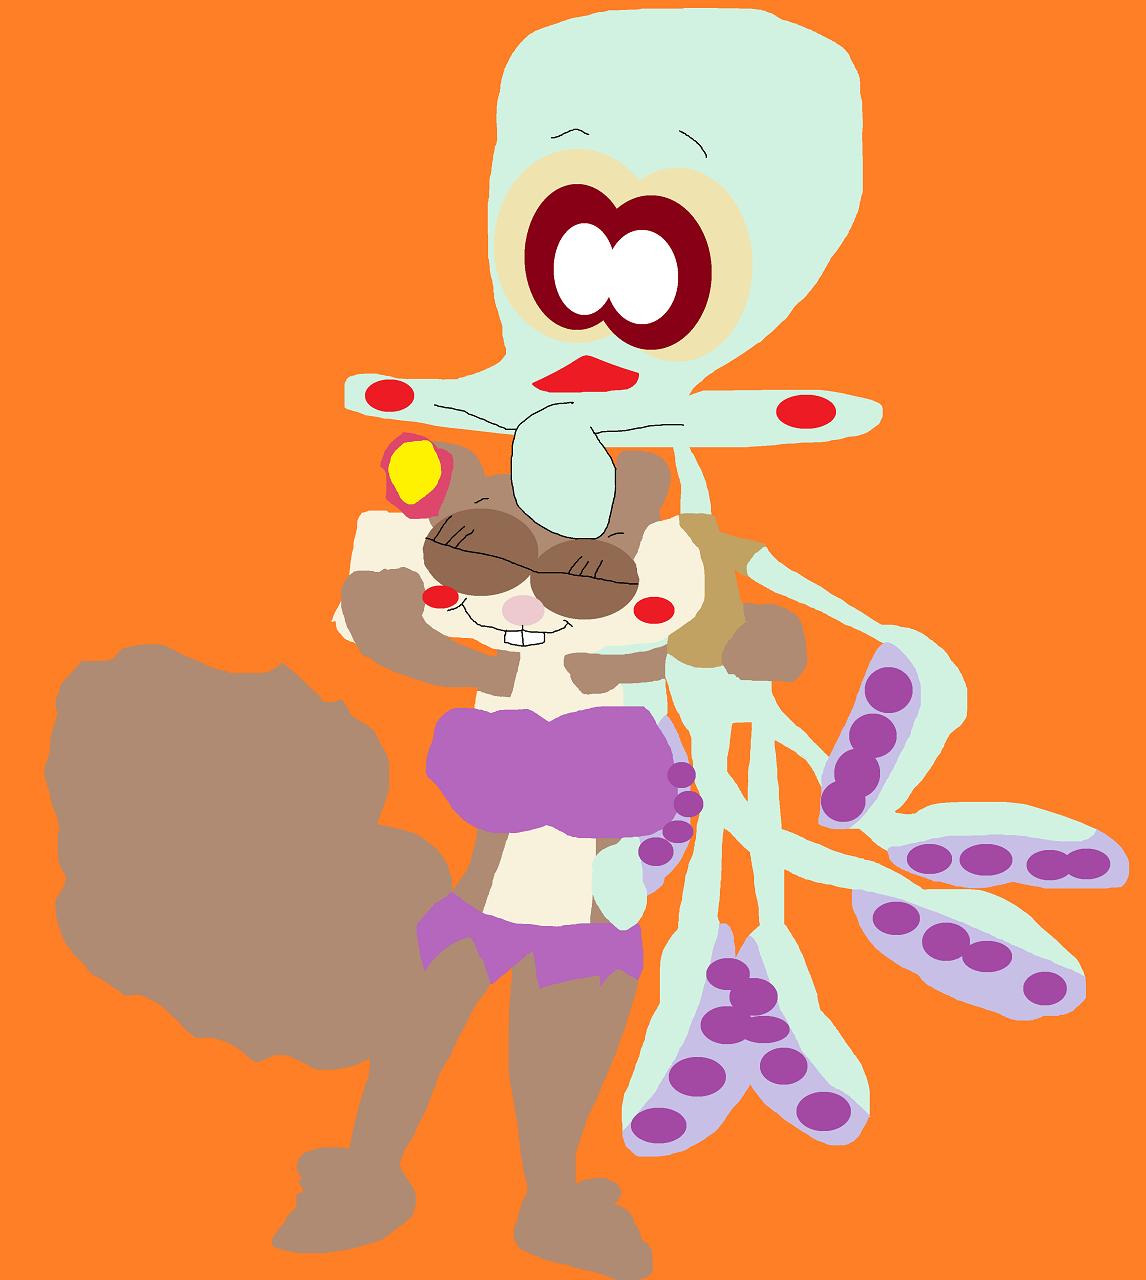 Sandy Hugging Squiddie Like A Plushie by Falconlobo